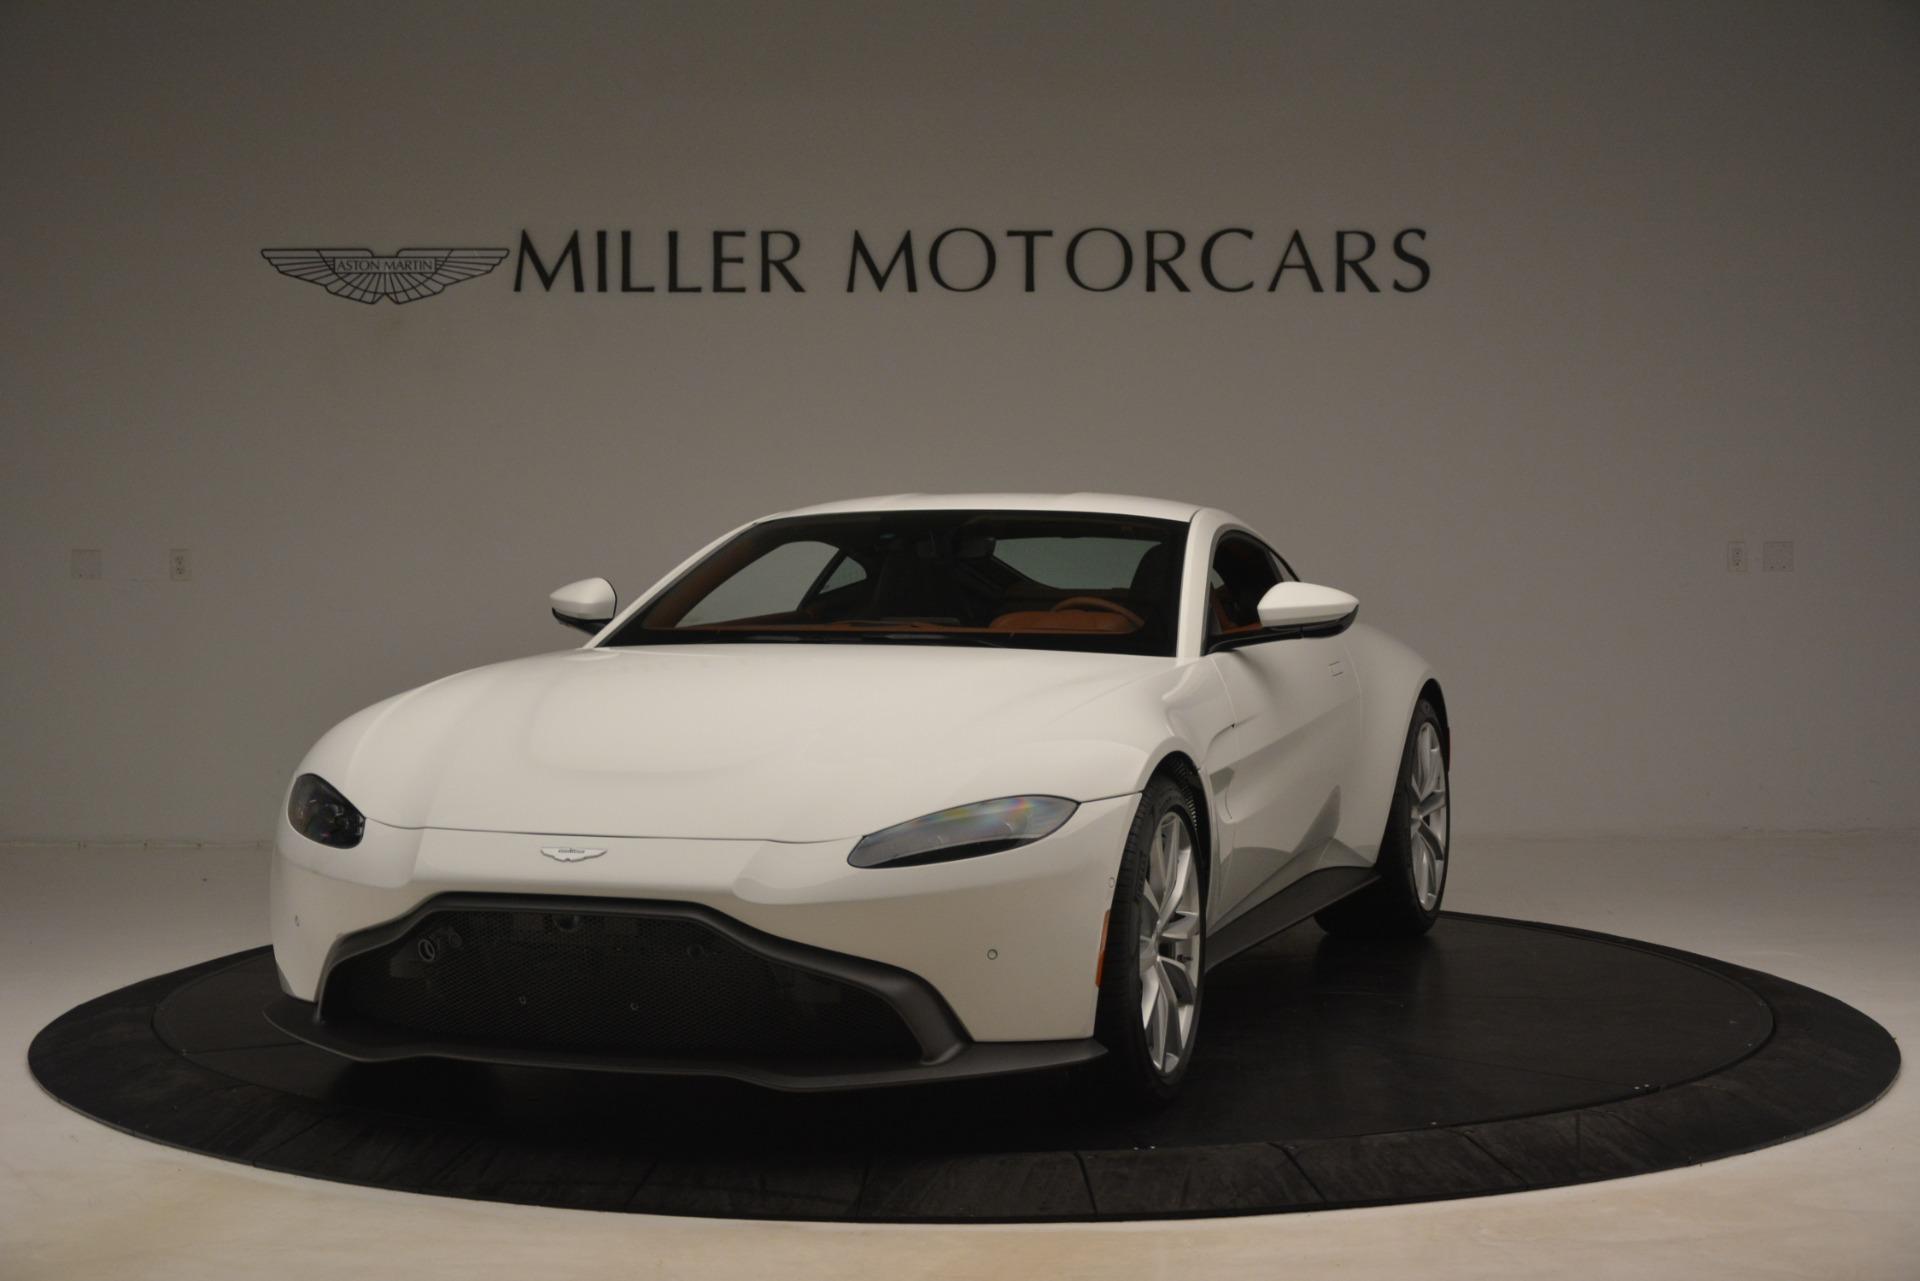 New 2019 Aston Martin Vantage Coupe For Sale In Greenwich, CT. Alfa Romeo of Greenwich, A1373 3227_p12